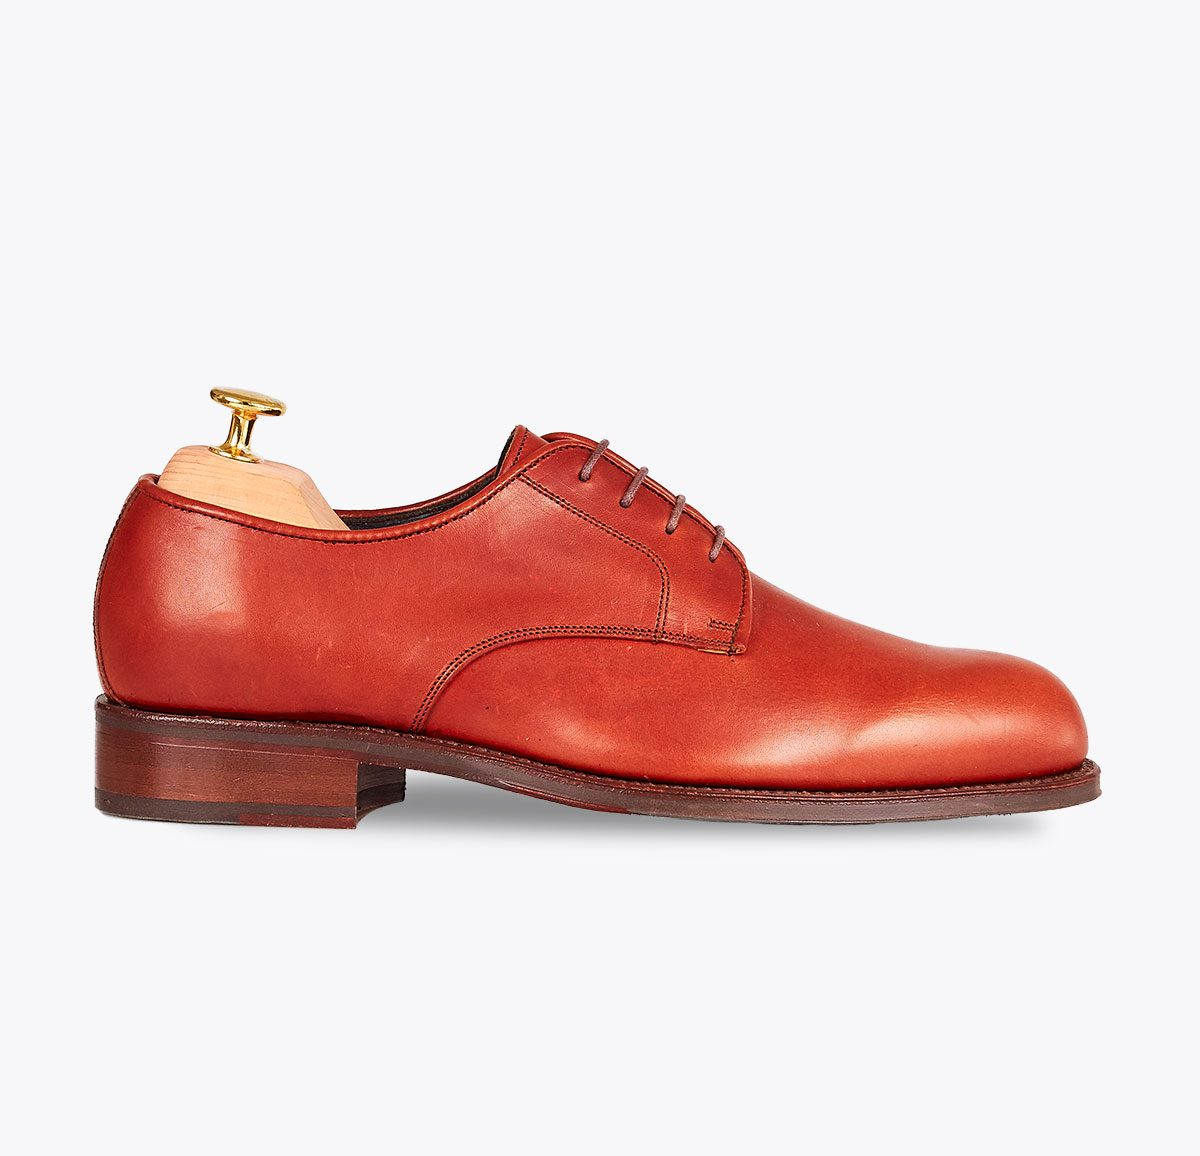 Zapato elegante hecho a mano en mandalashoes, Santanyí Mallorca. Hand made shoes. Nach Mass Schuhe